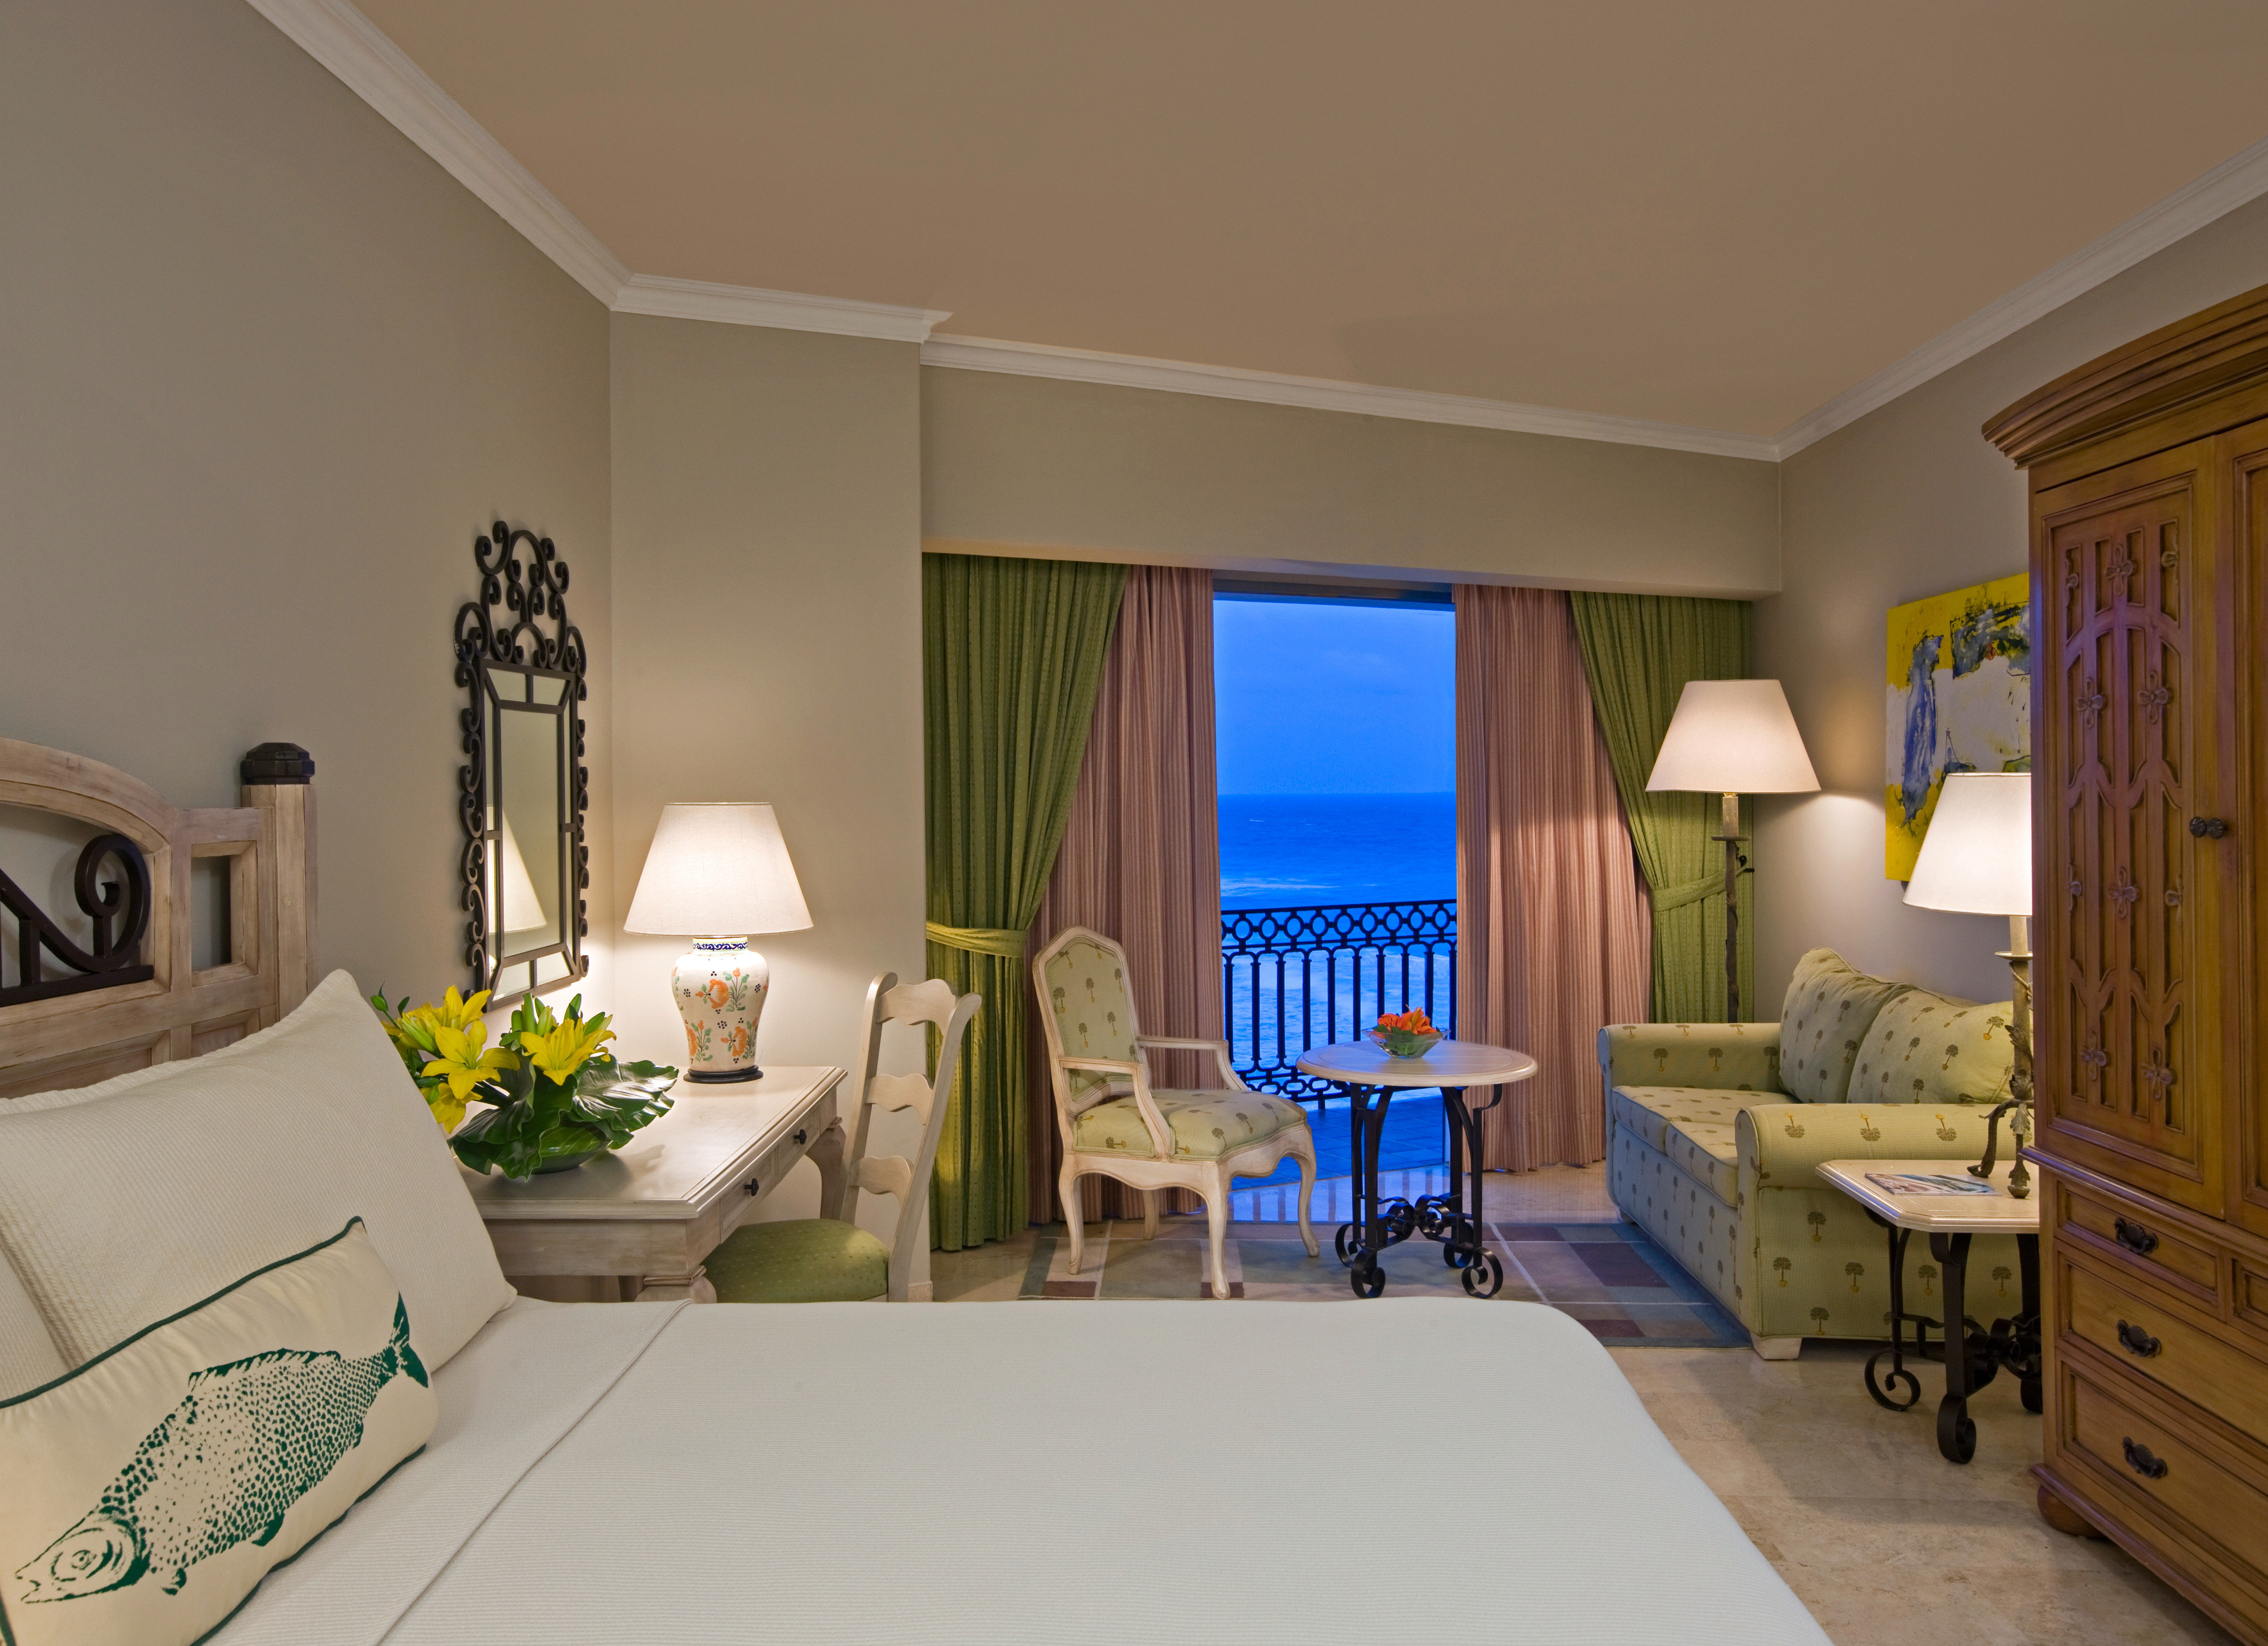 Balcony Beachfront Bedroom Suite property living room home house condominium cottage Villa mansion farmhouse